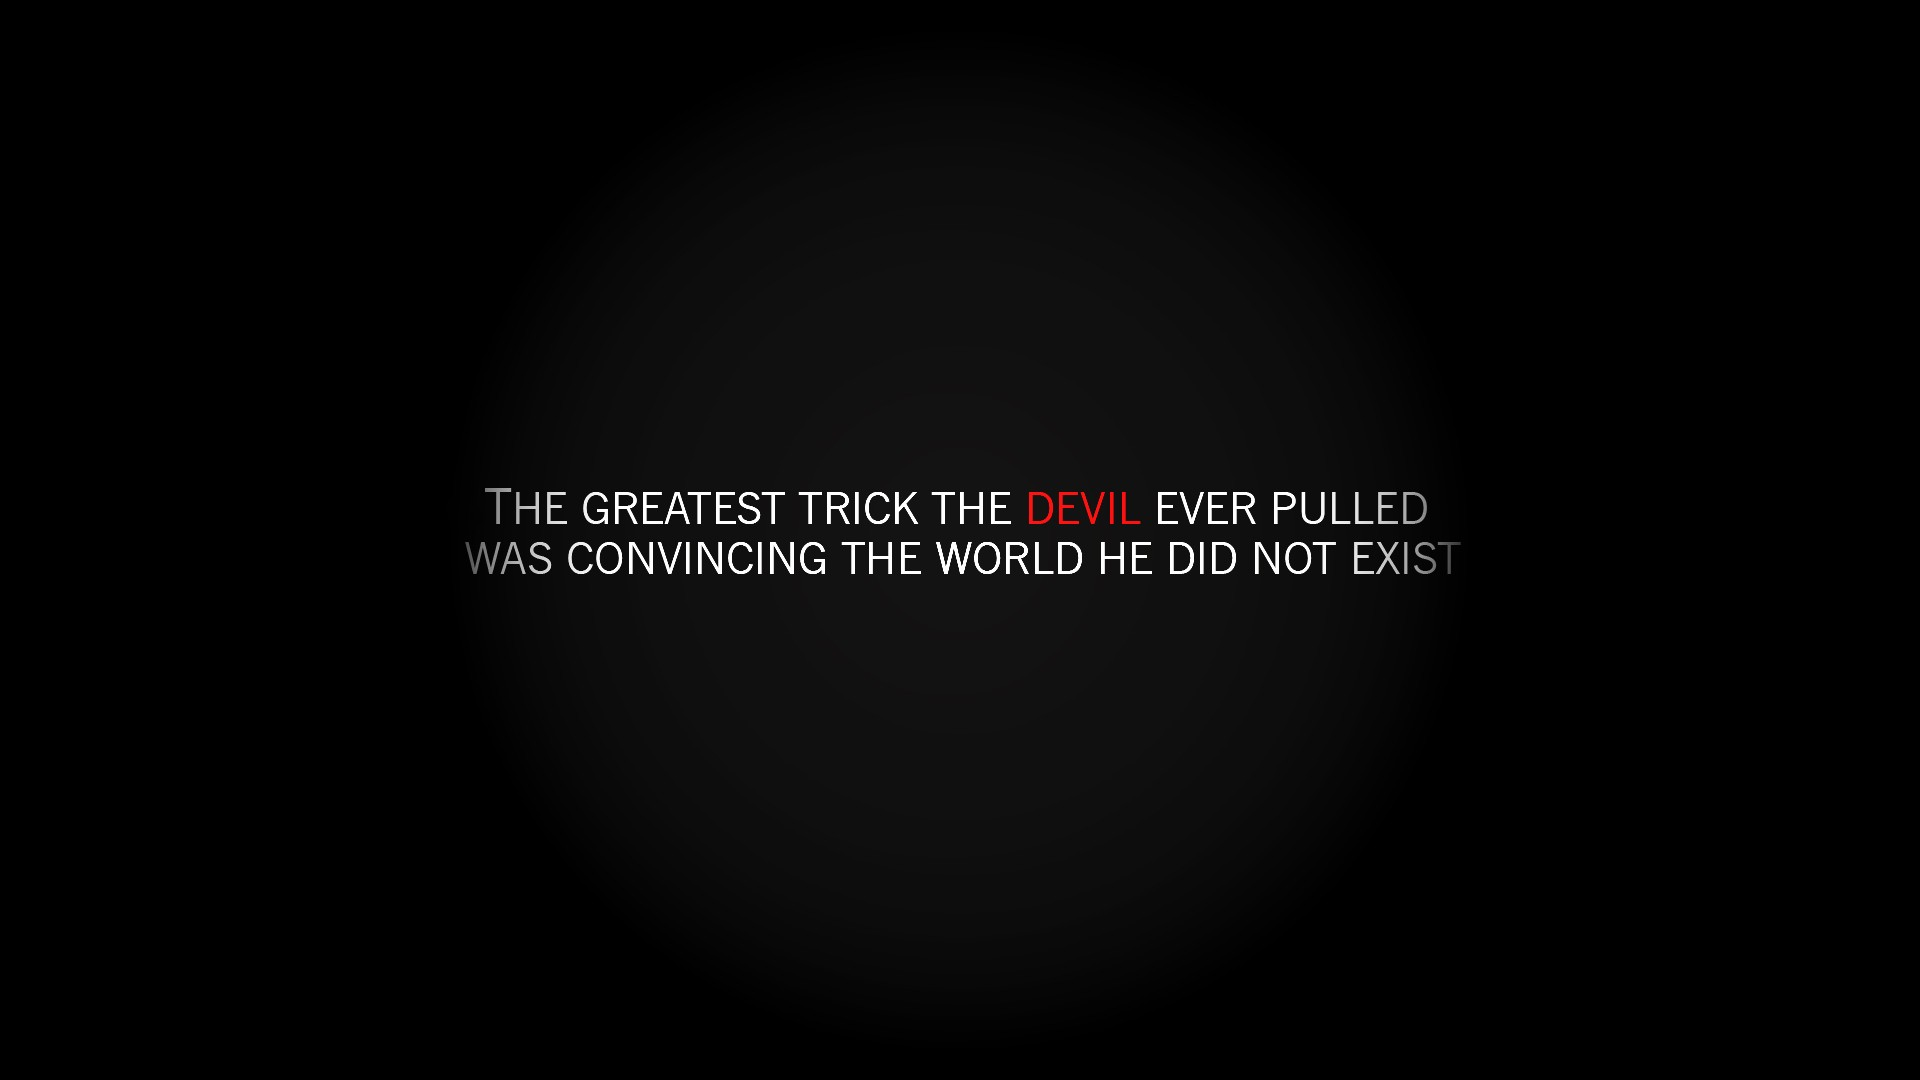 Devil quote #7